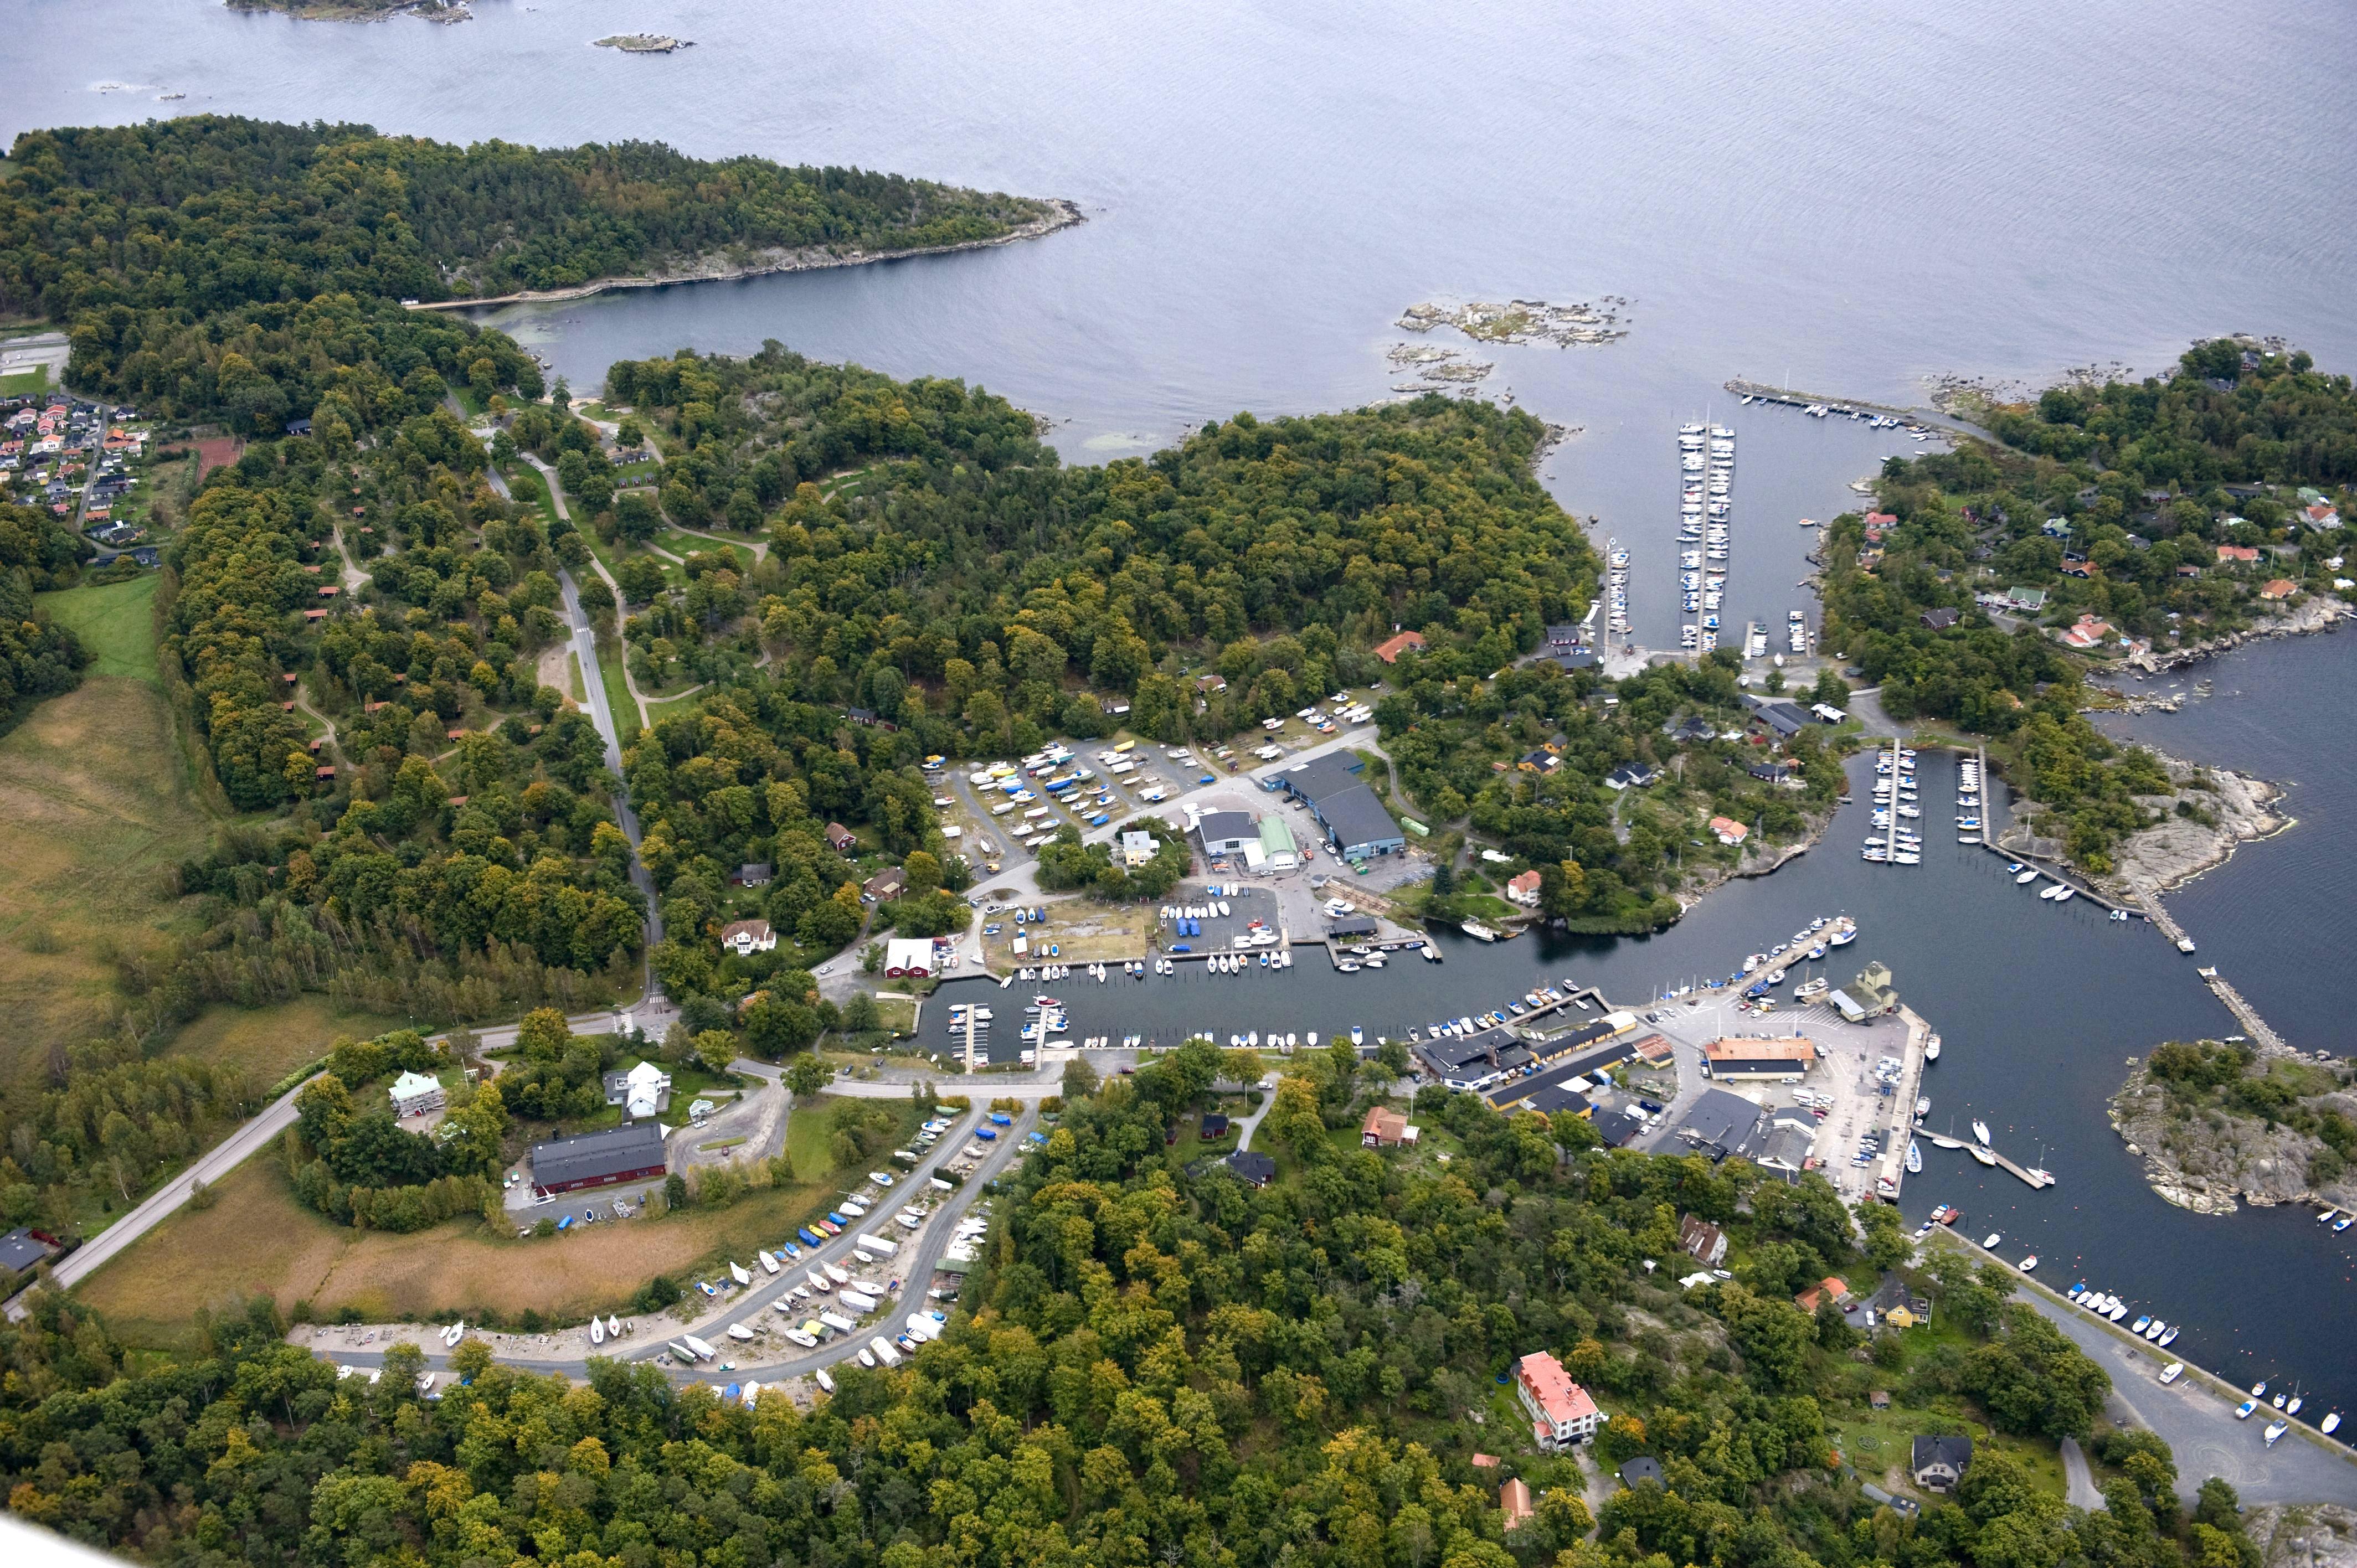 Karlshamn Boat Show, Overview, Seminars - Visit Karlshamn